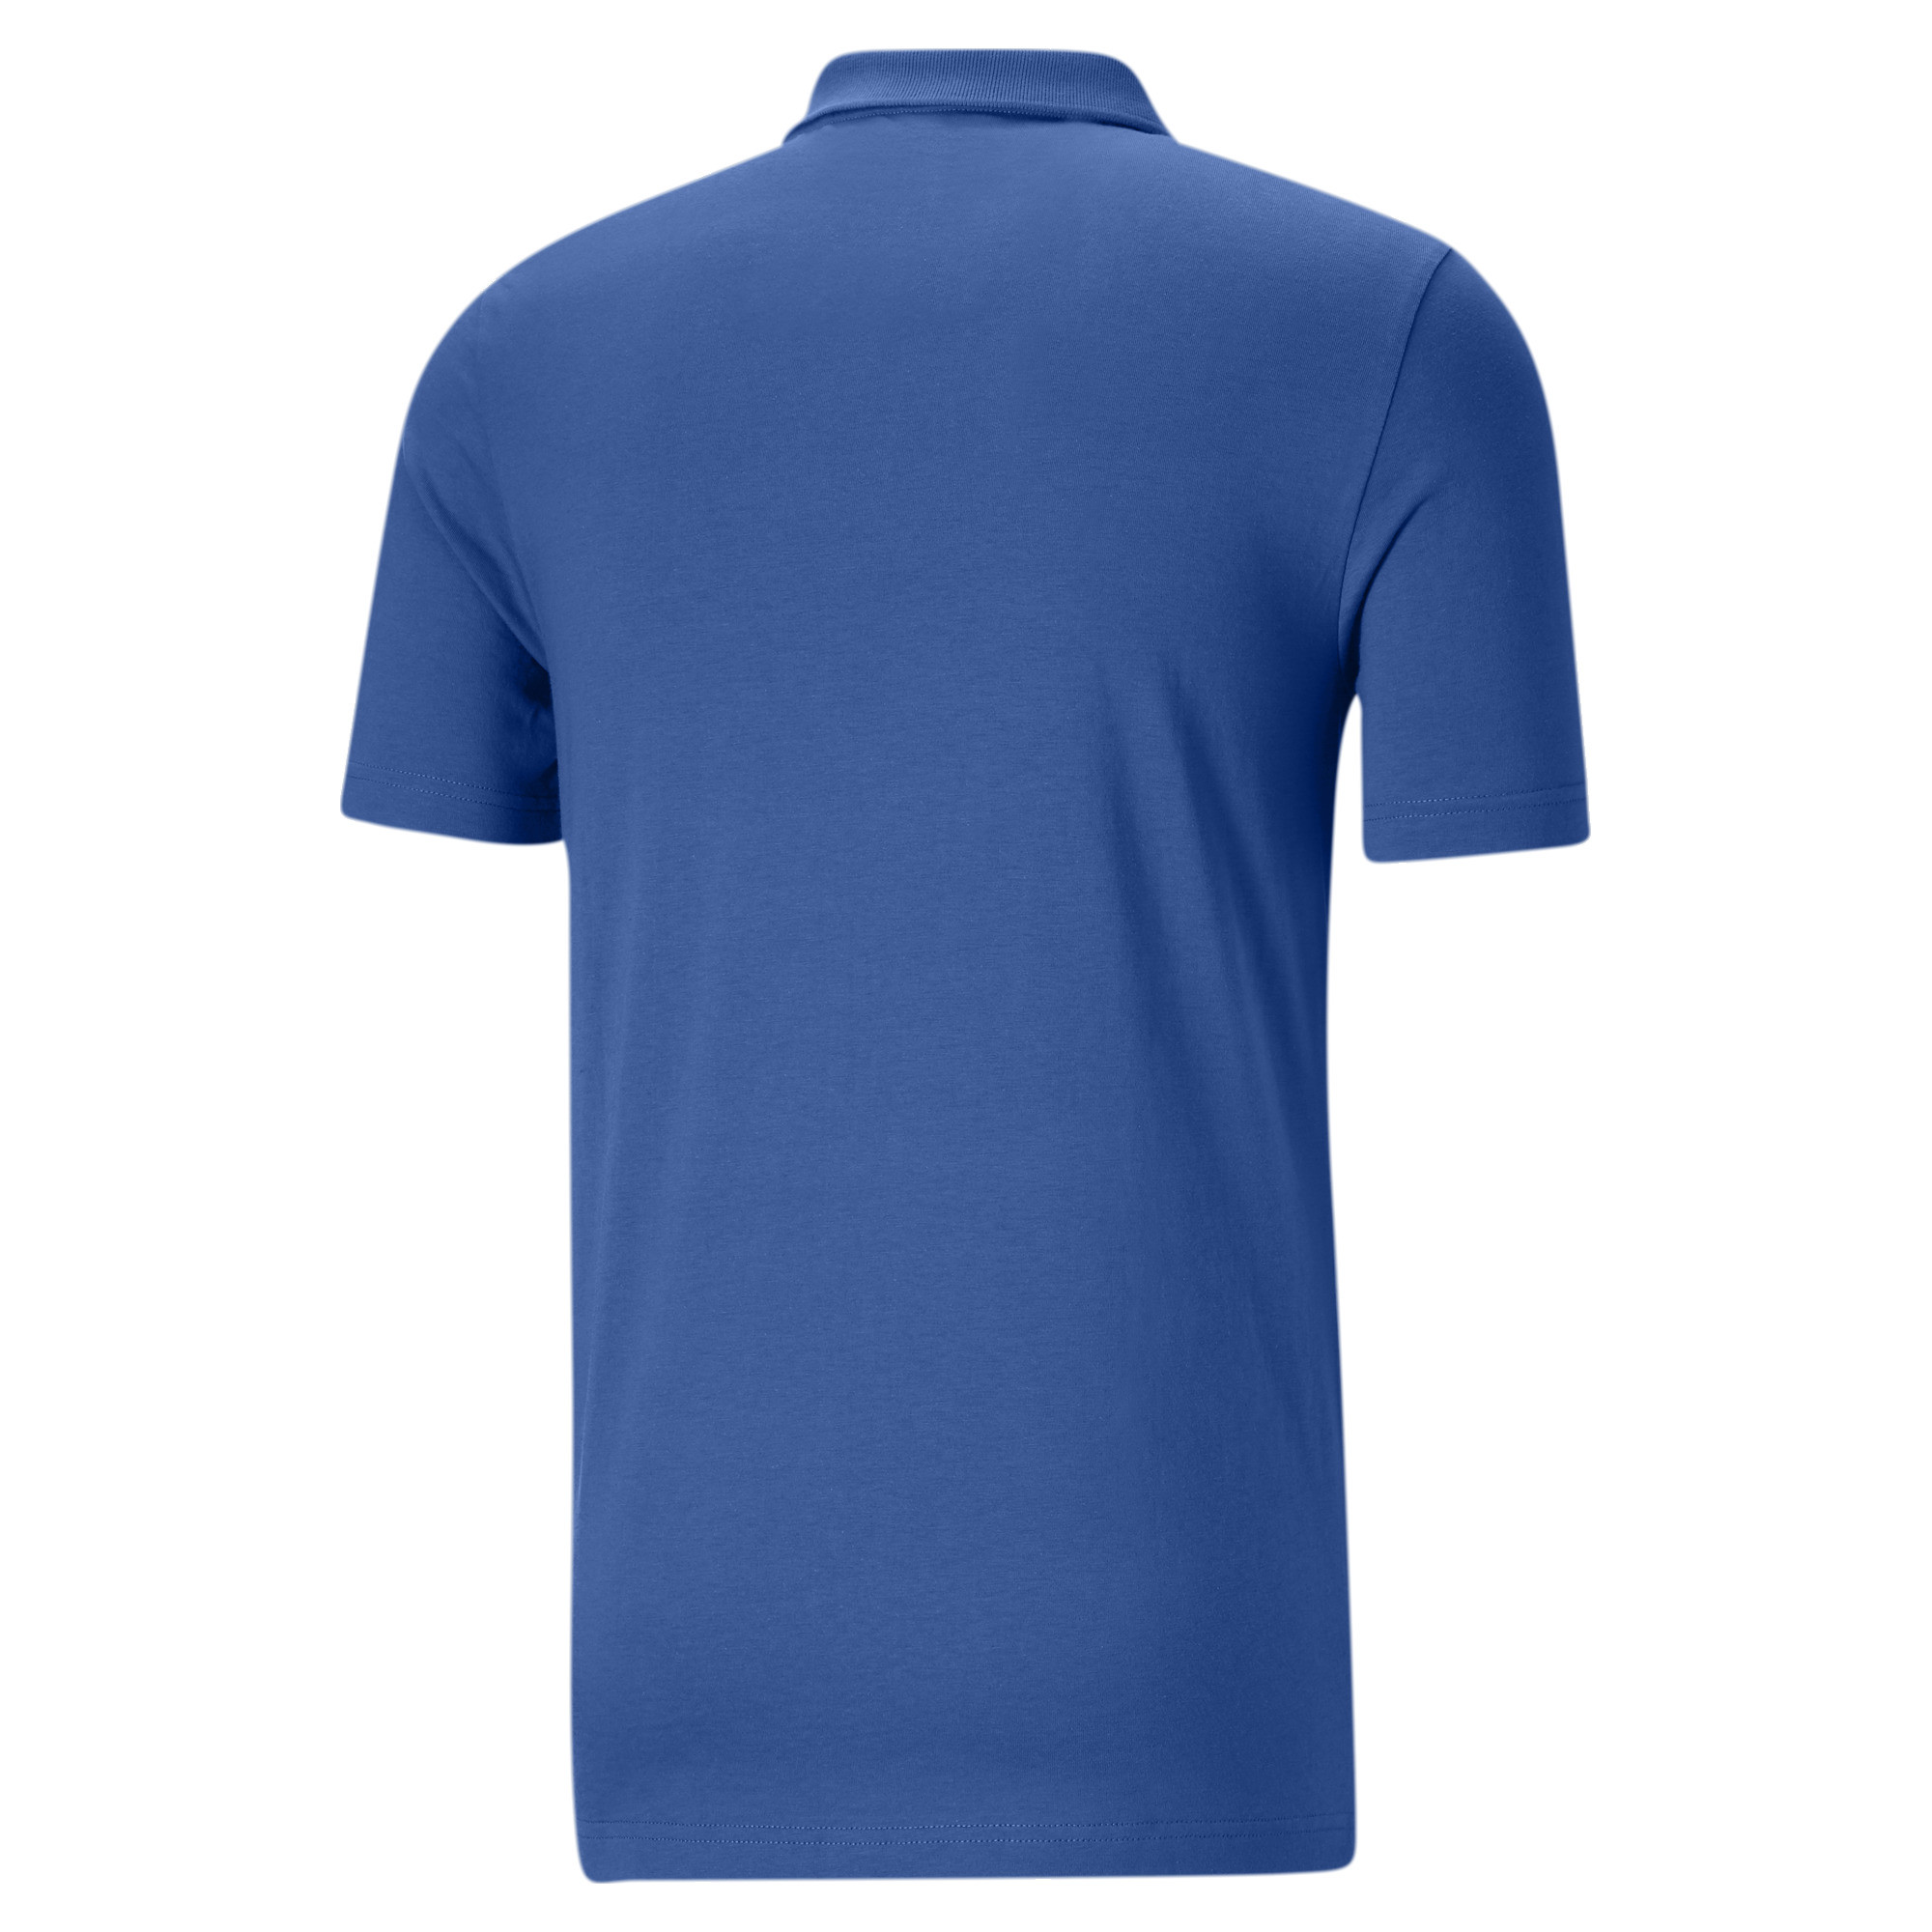 thumbnail 23 - PUMA Men's Essentials Jersey Polo